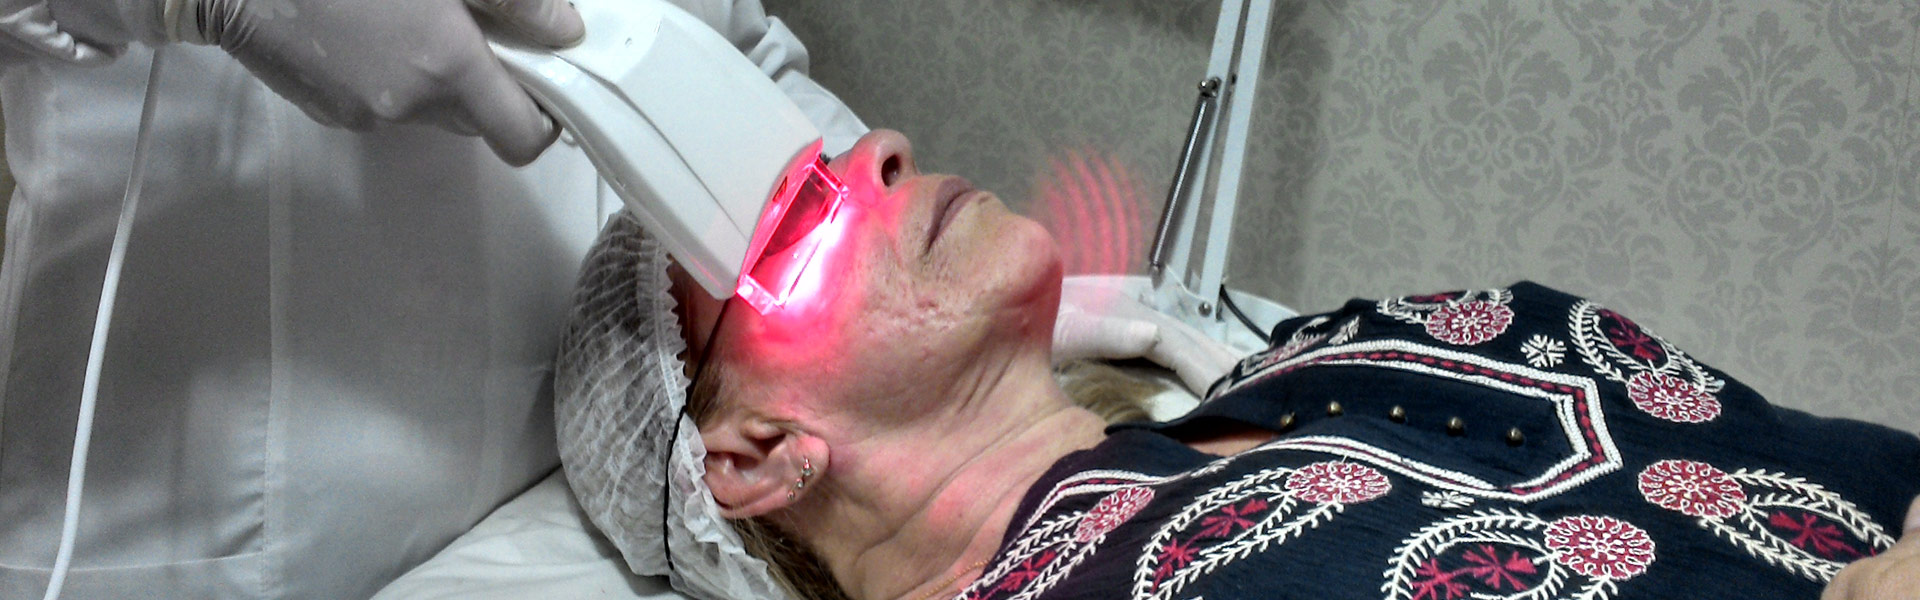 laser-e-led-terapia-estetica-facial-laserterapia